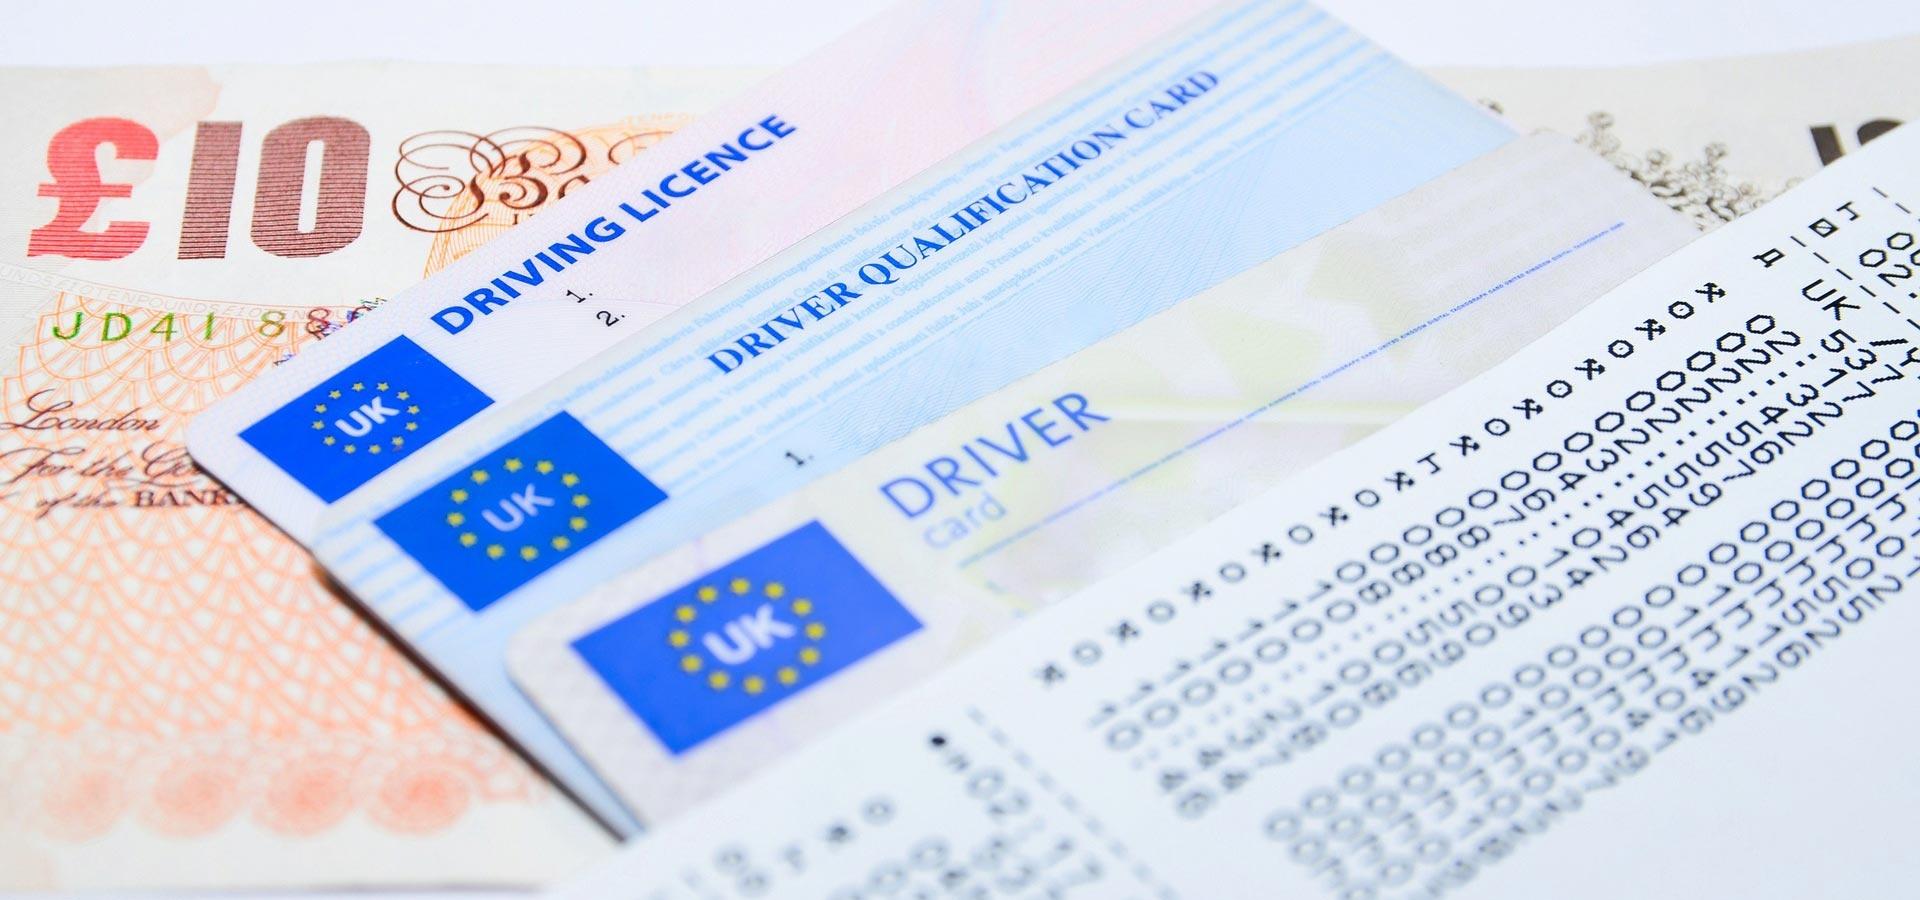 Conduire à l'étranger - Quel permis de conduire ?